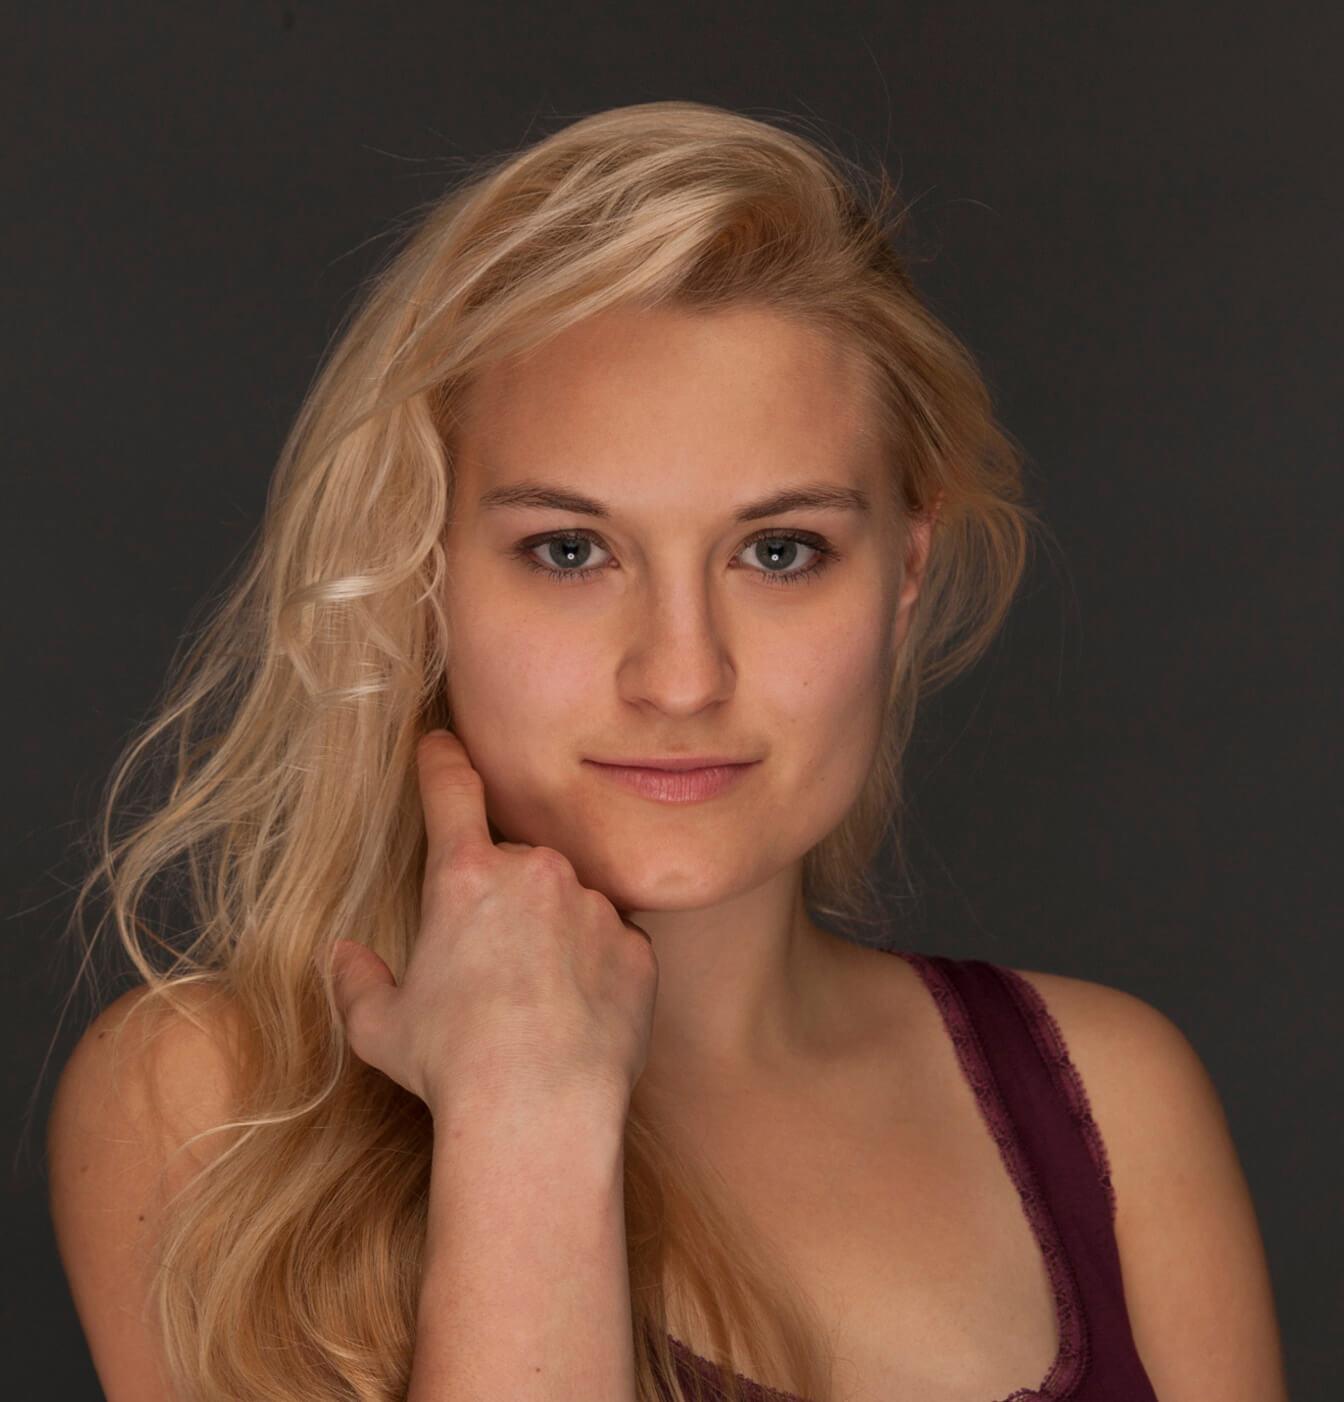 Valerie Wilhelm